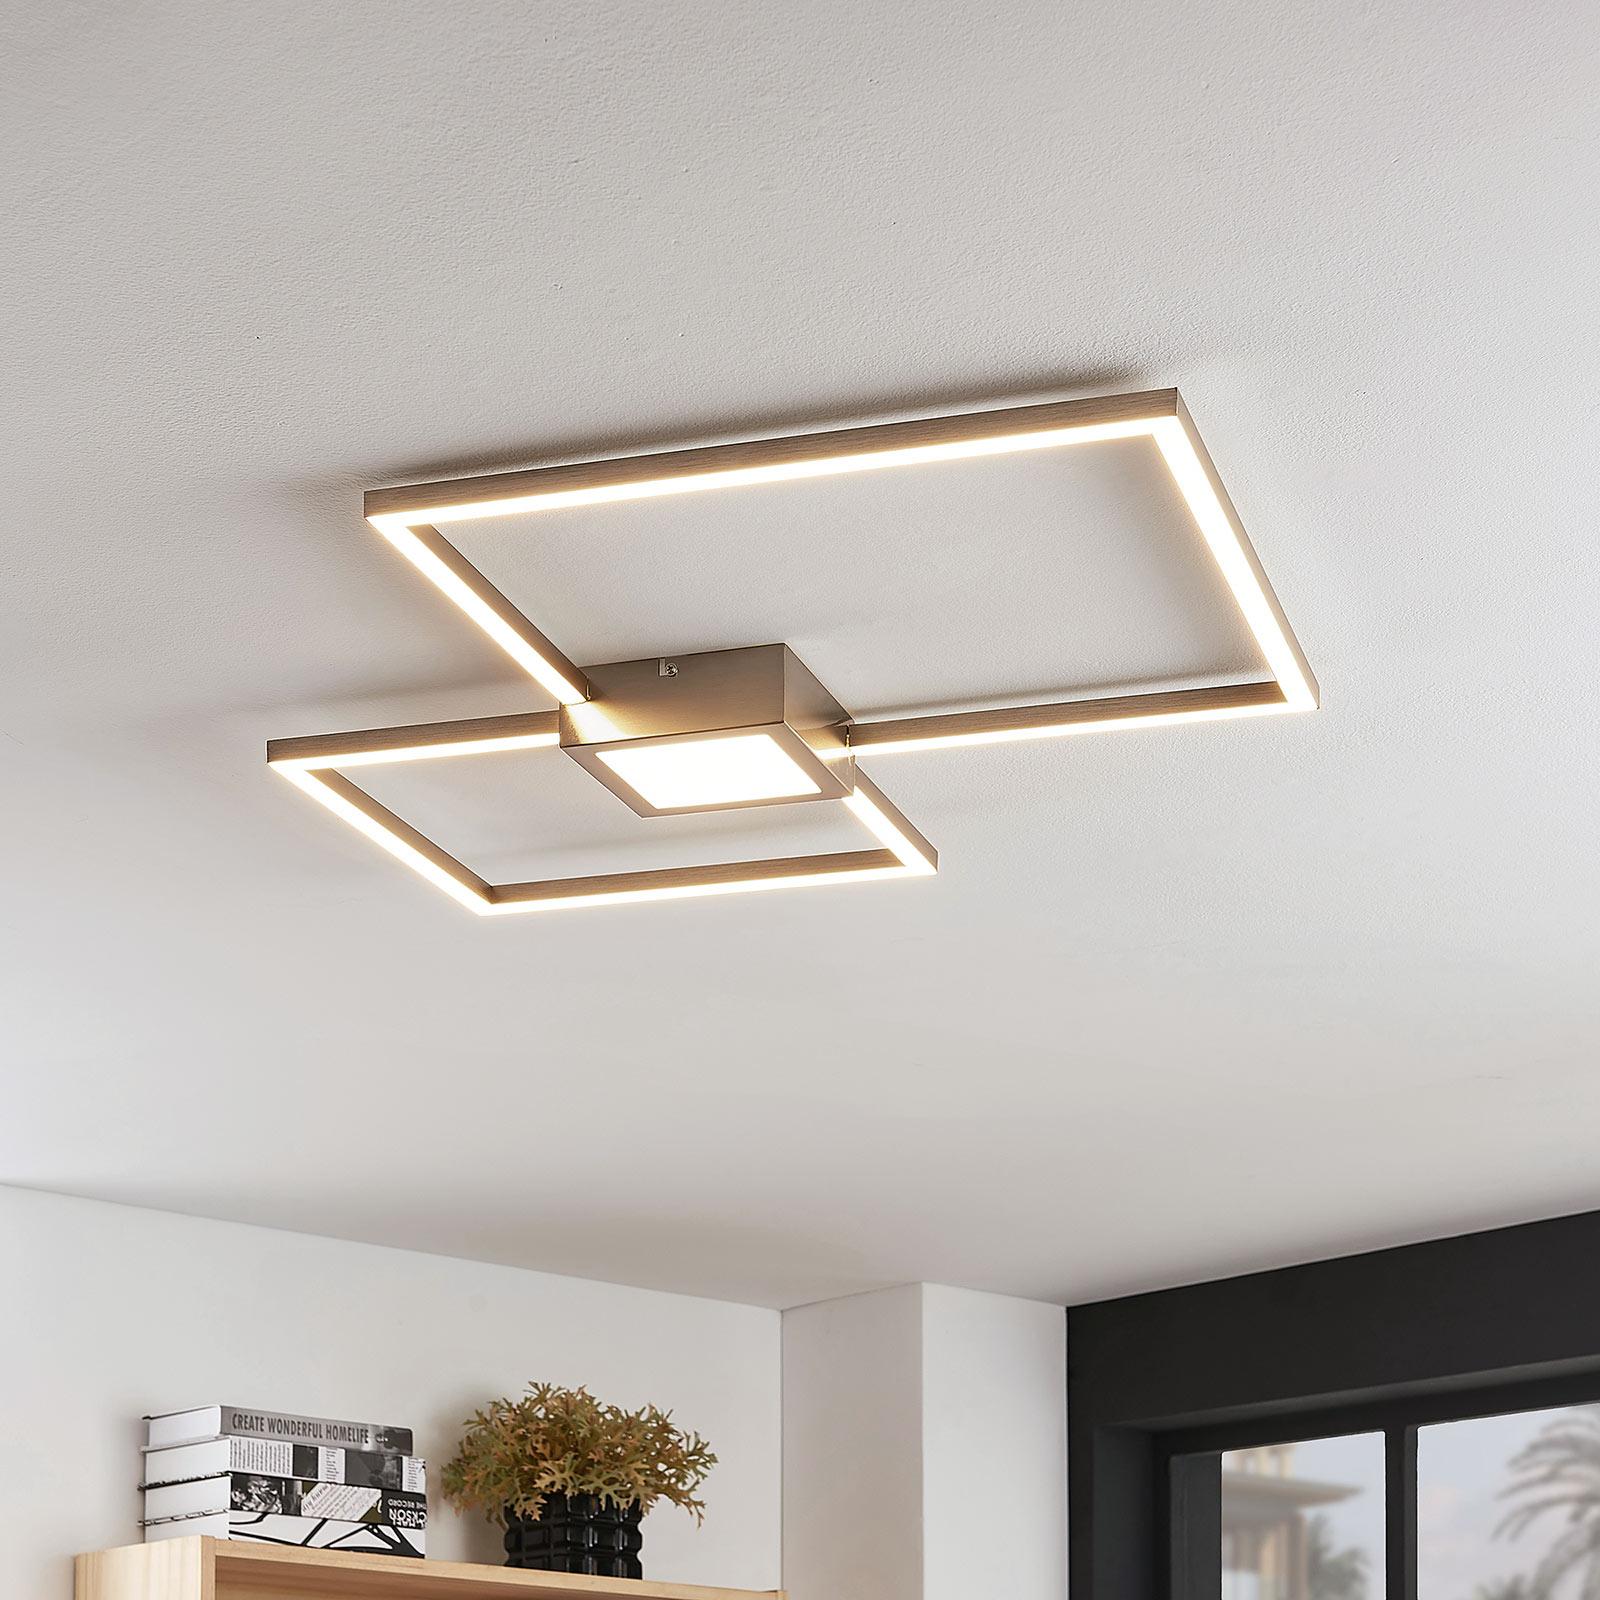 Stropné LED svietidlo Duetto, štvorce_8032127_1